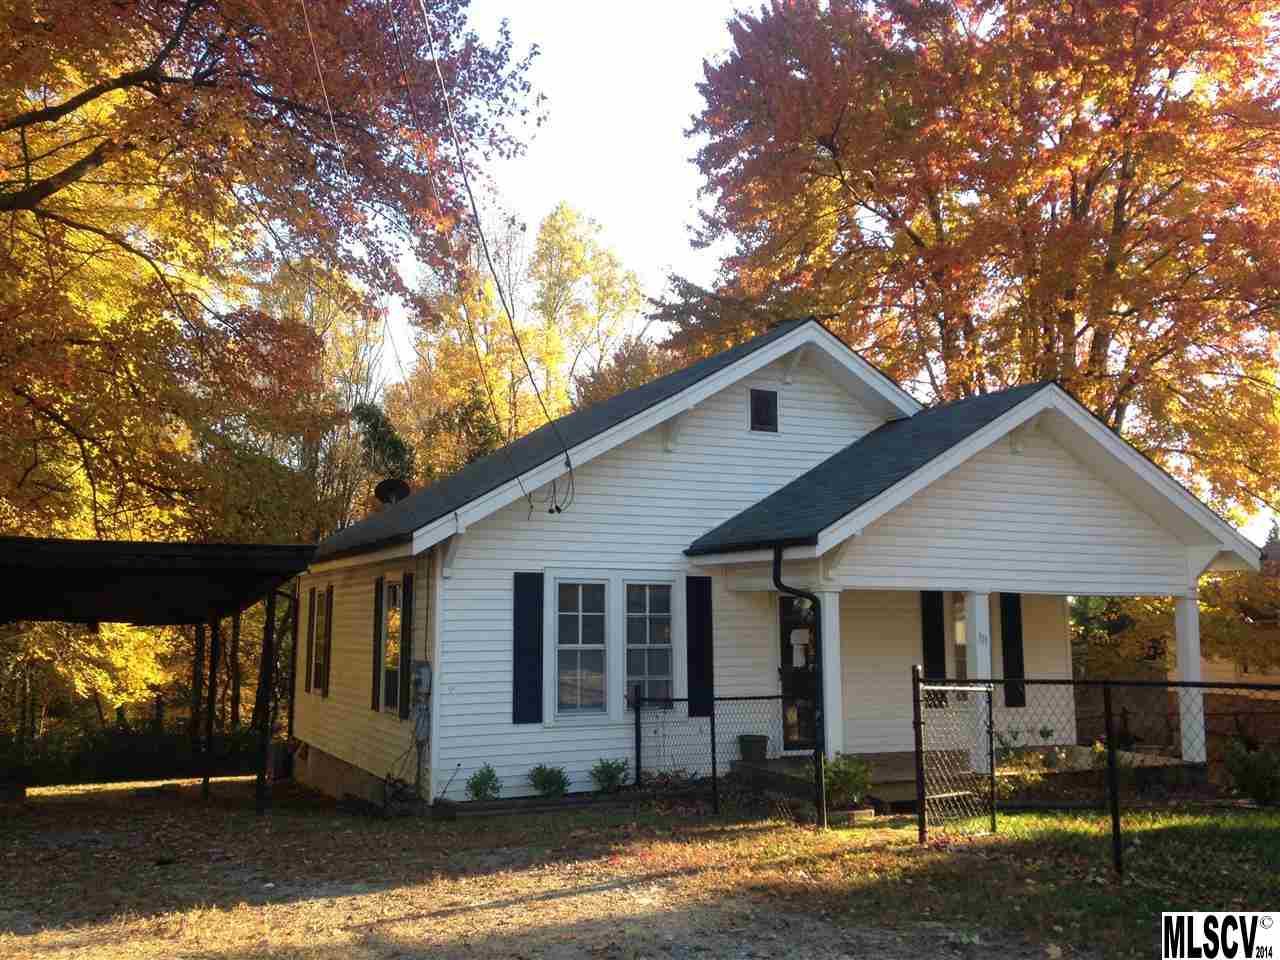 Real Estate for Sale, ListingId: 30748018, Hickory,NC28602